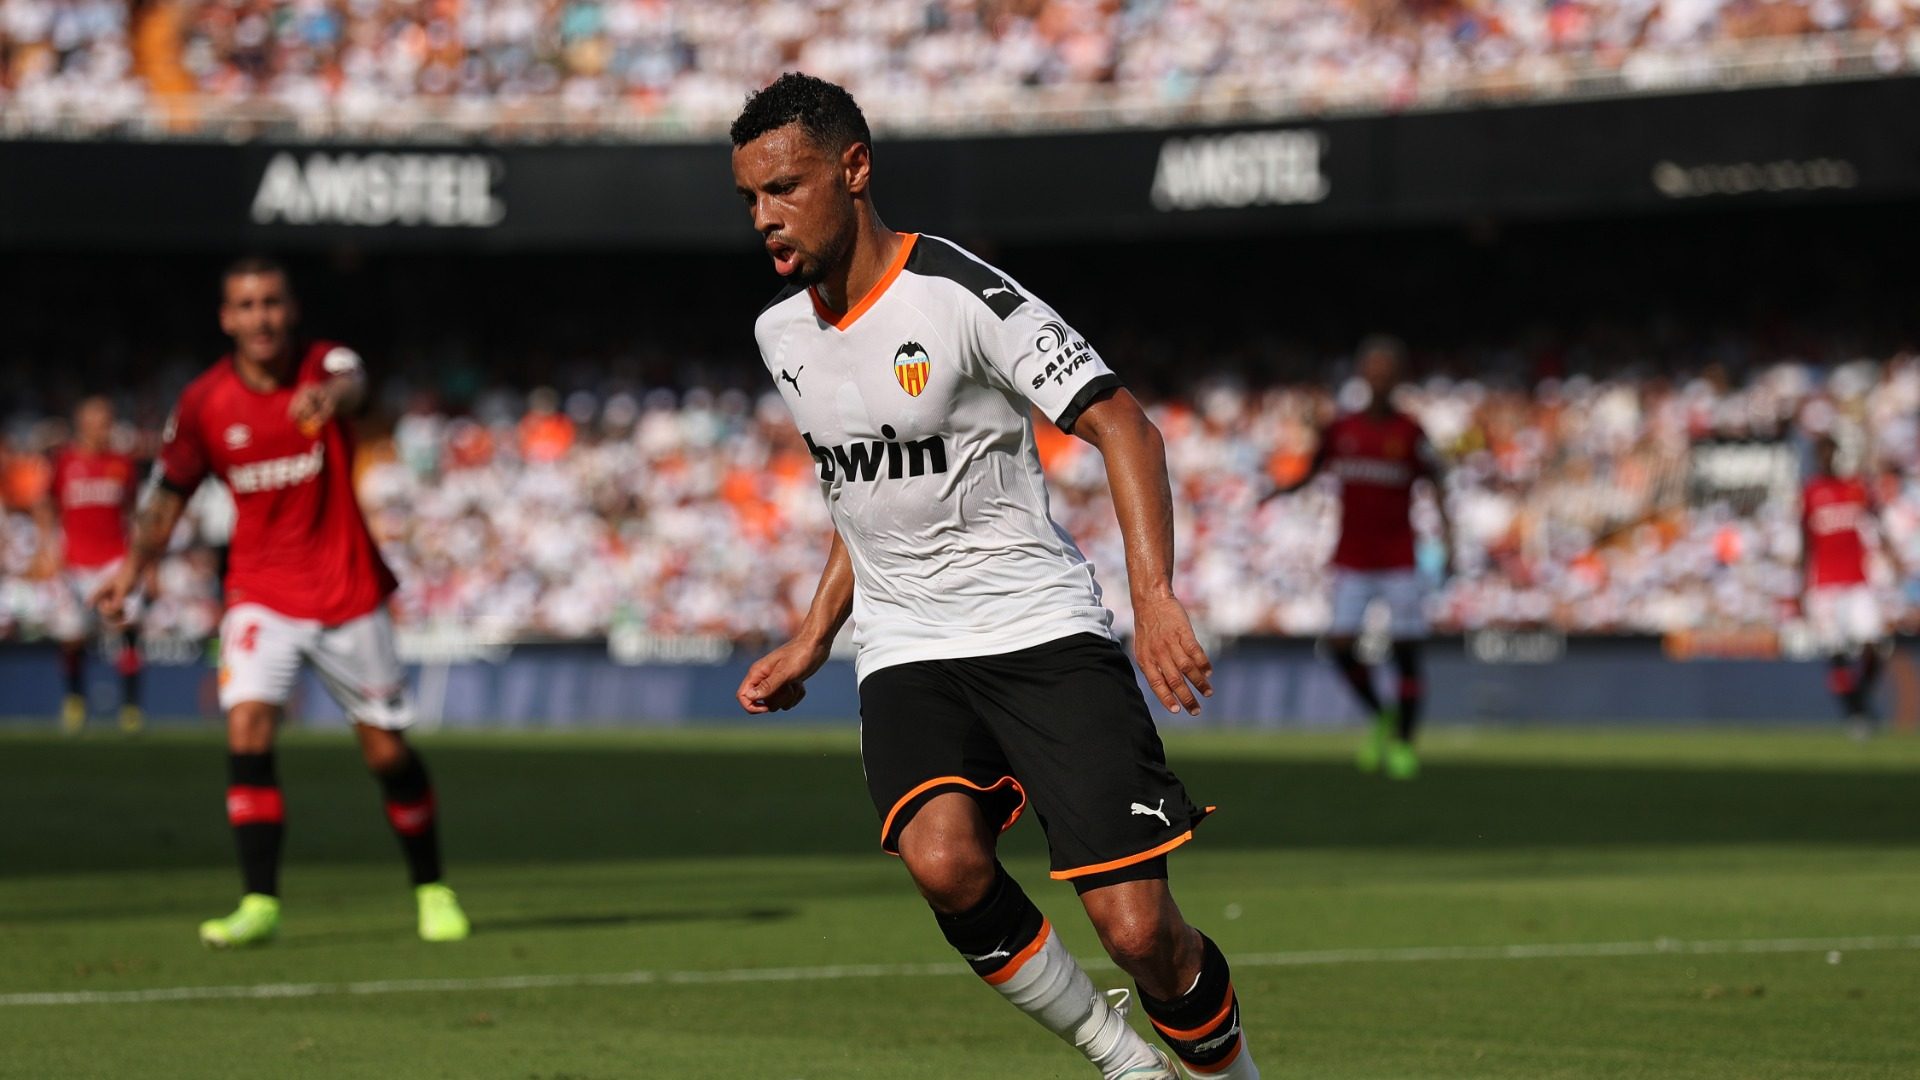 Ex-Arsenal midfielder Coquelin completes Villarreal switch